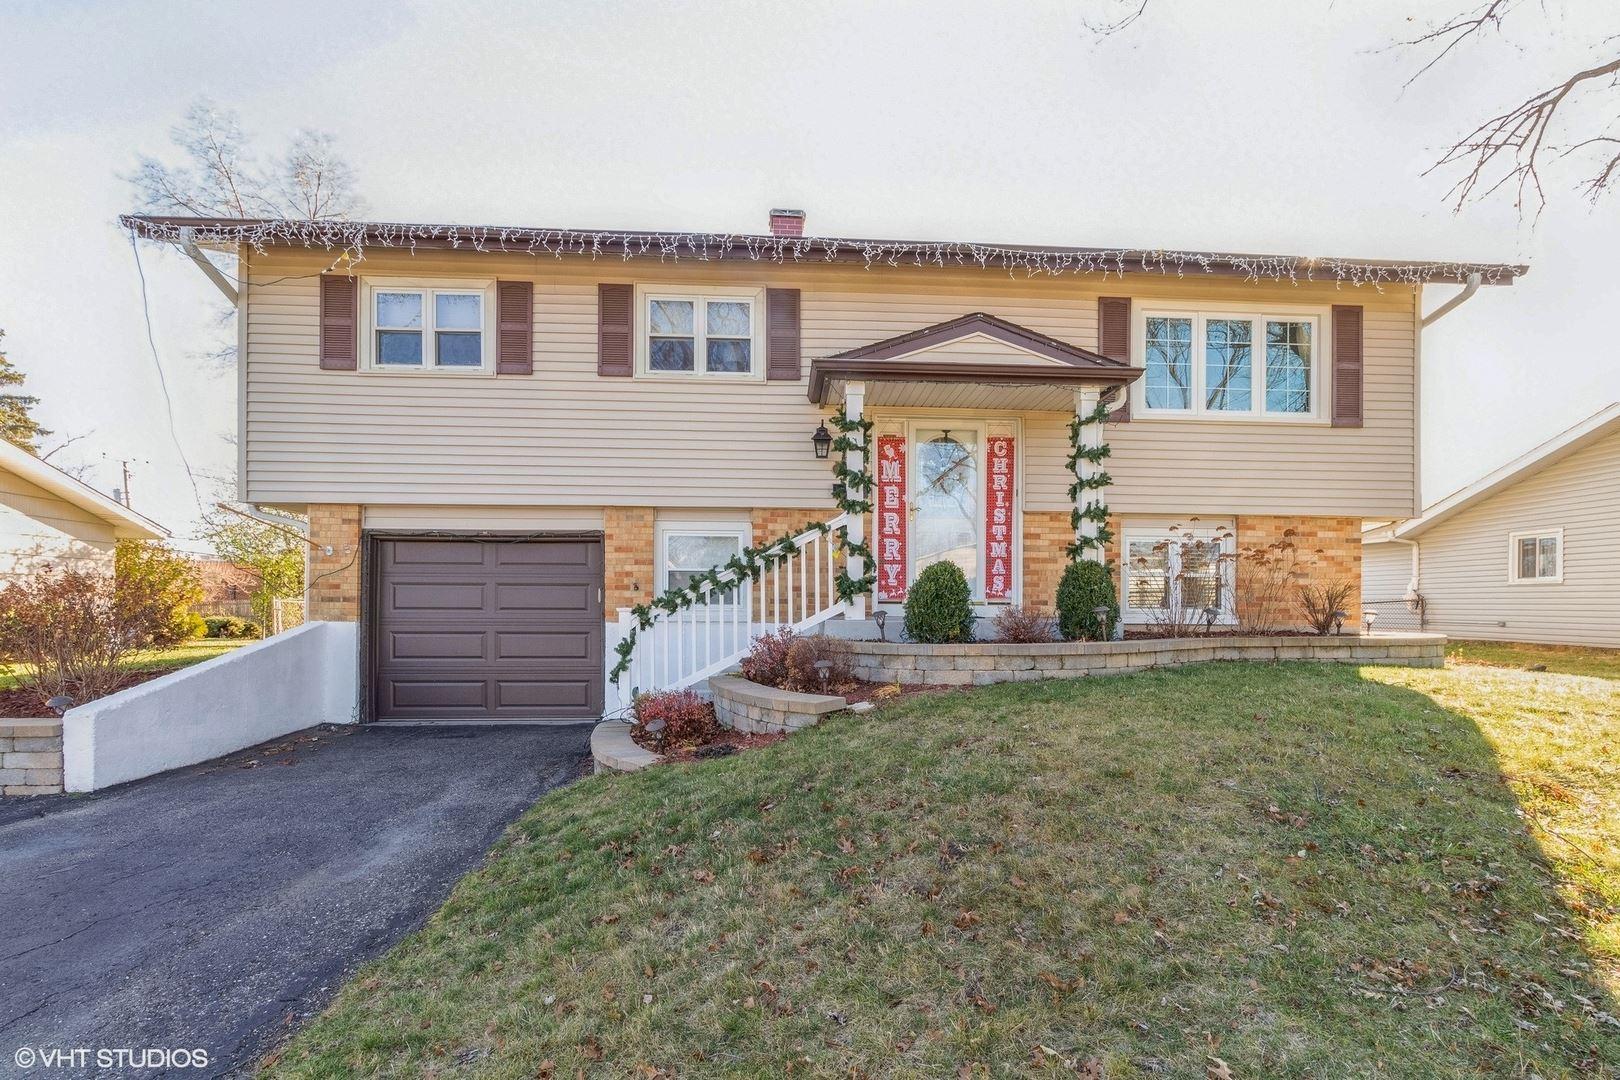 575 Amherst Lane, Hoffman Estates, IL 60169 - #: 10947953